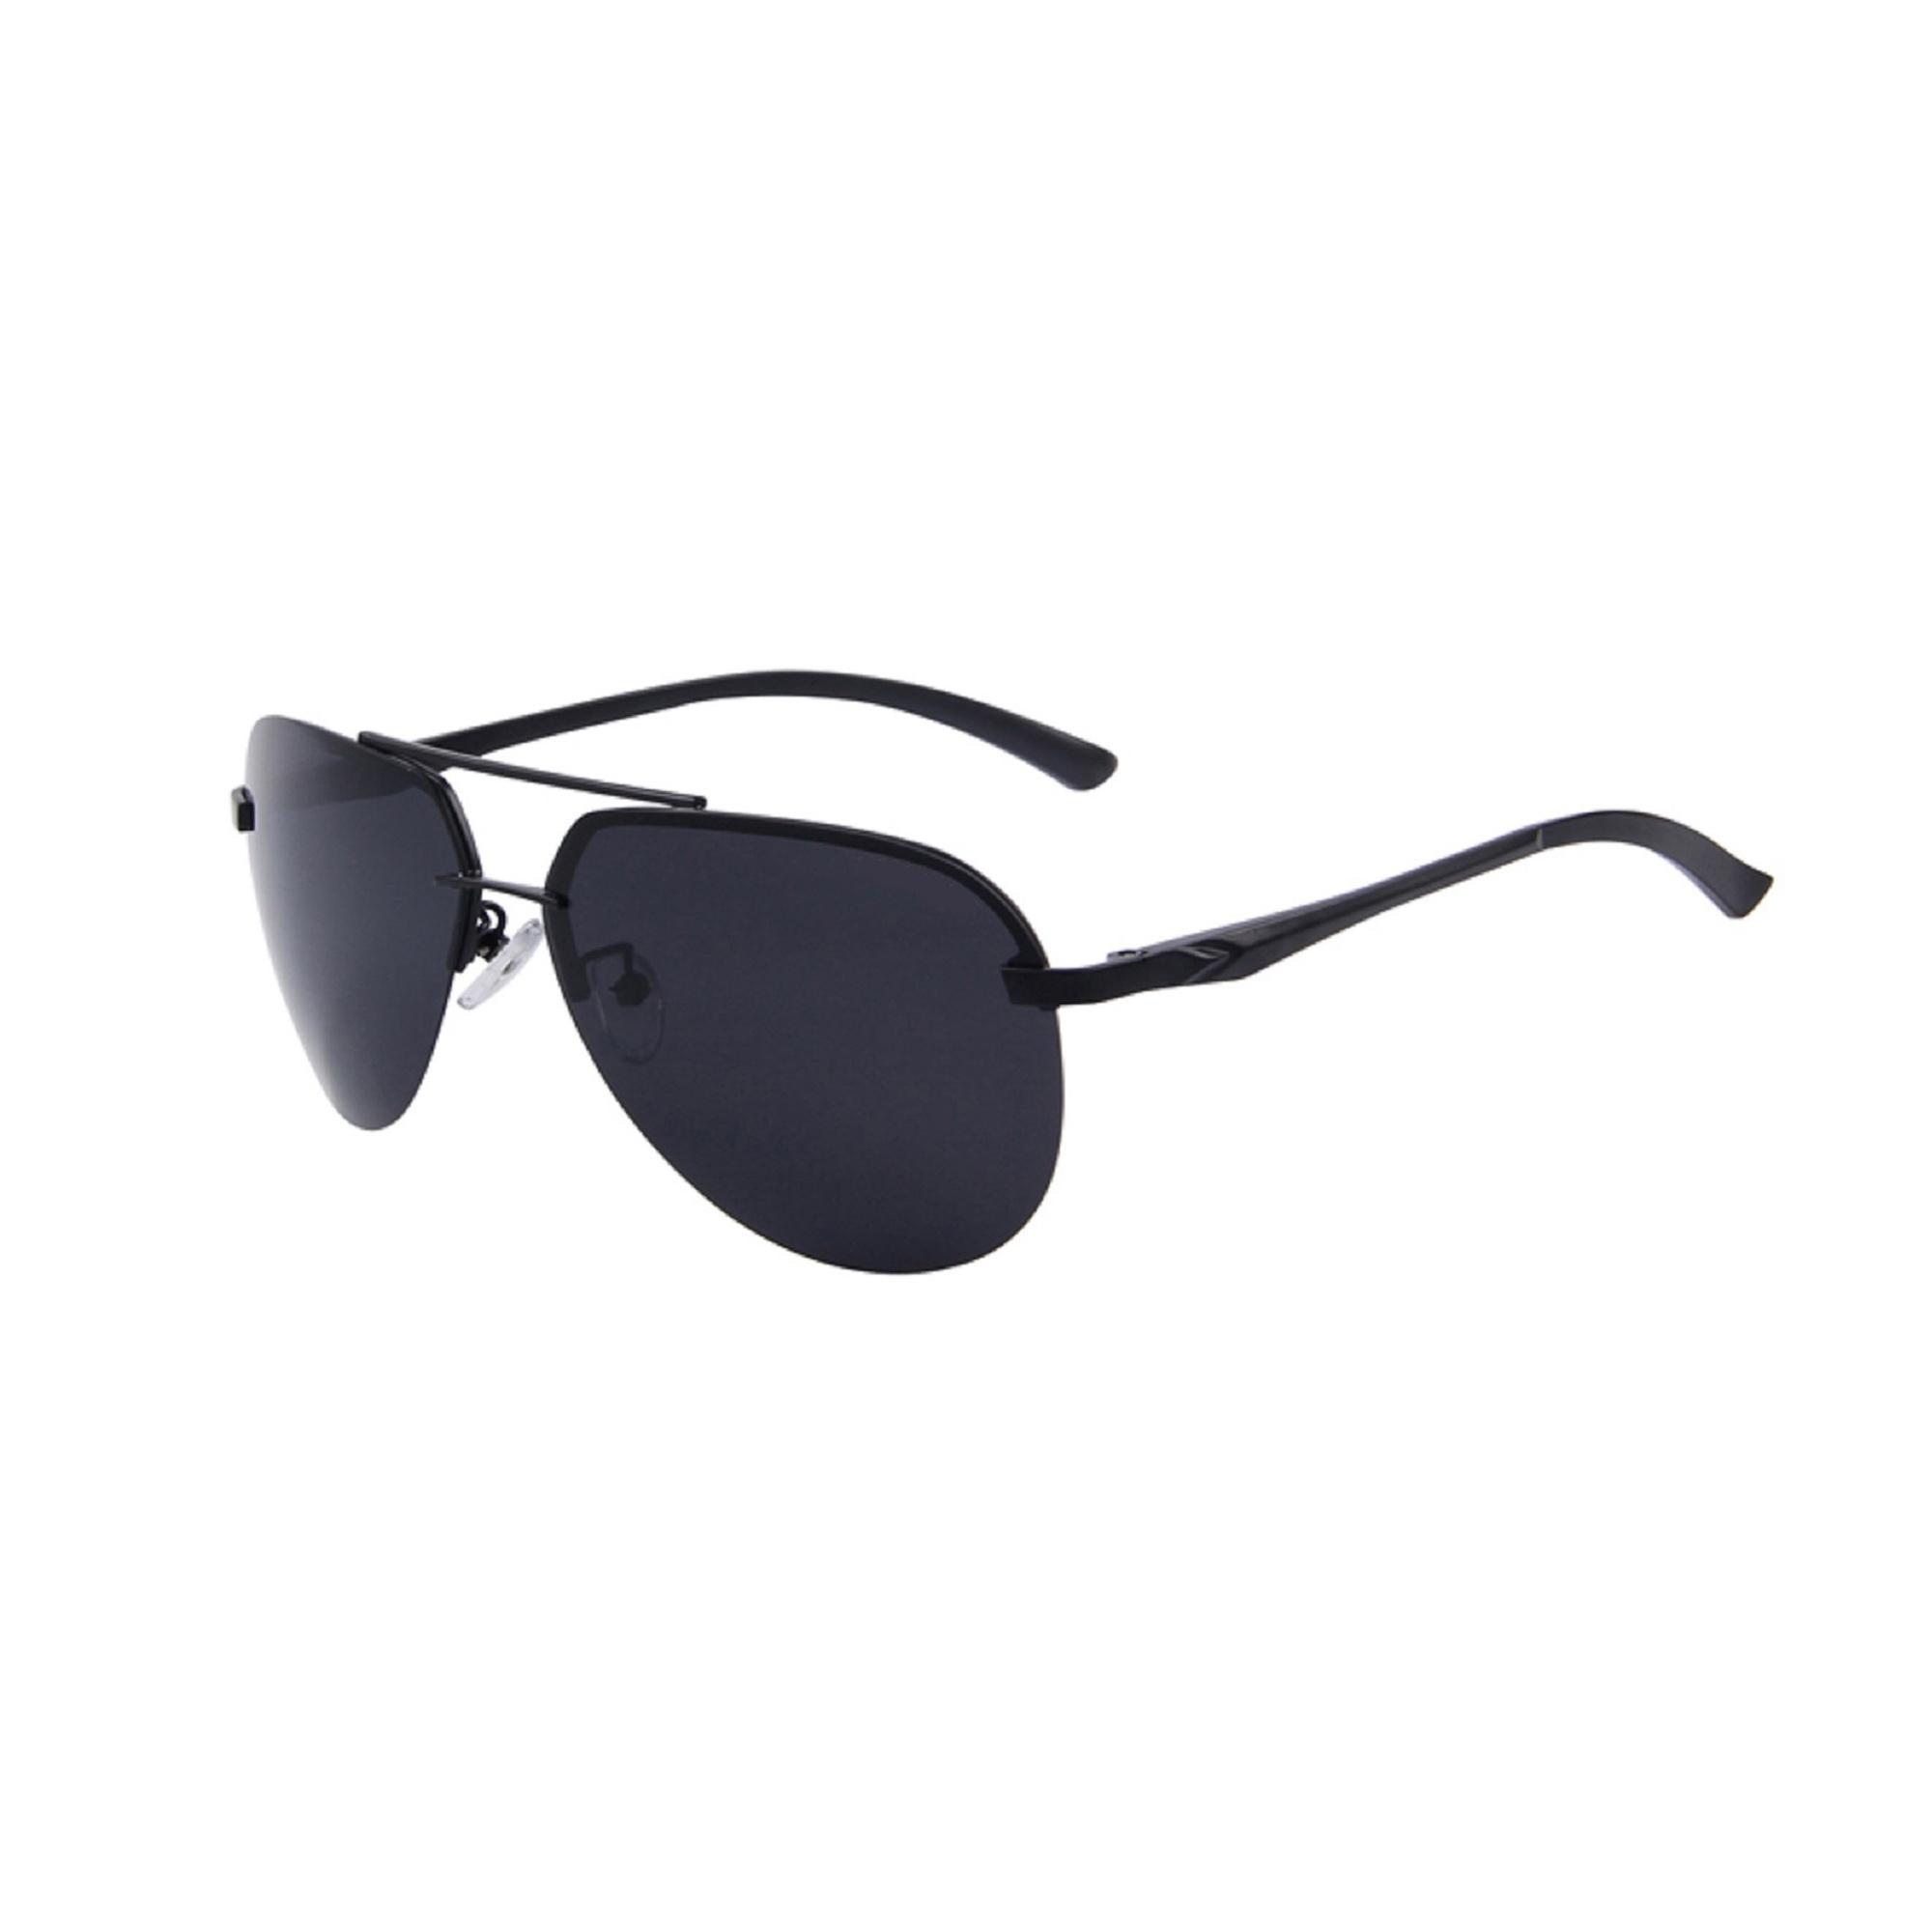 Premium Black Polarized Aviator Sunglasses